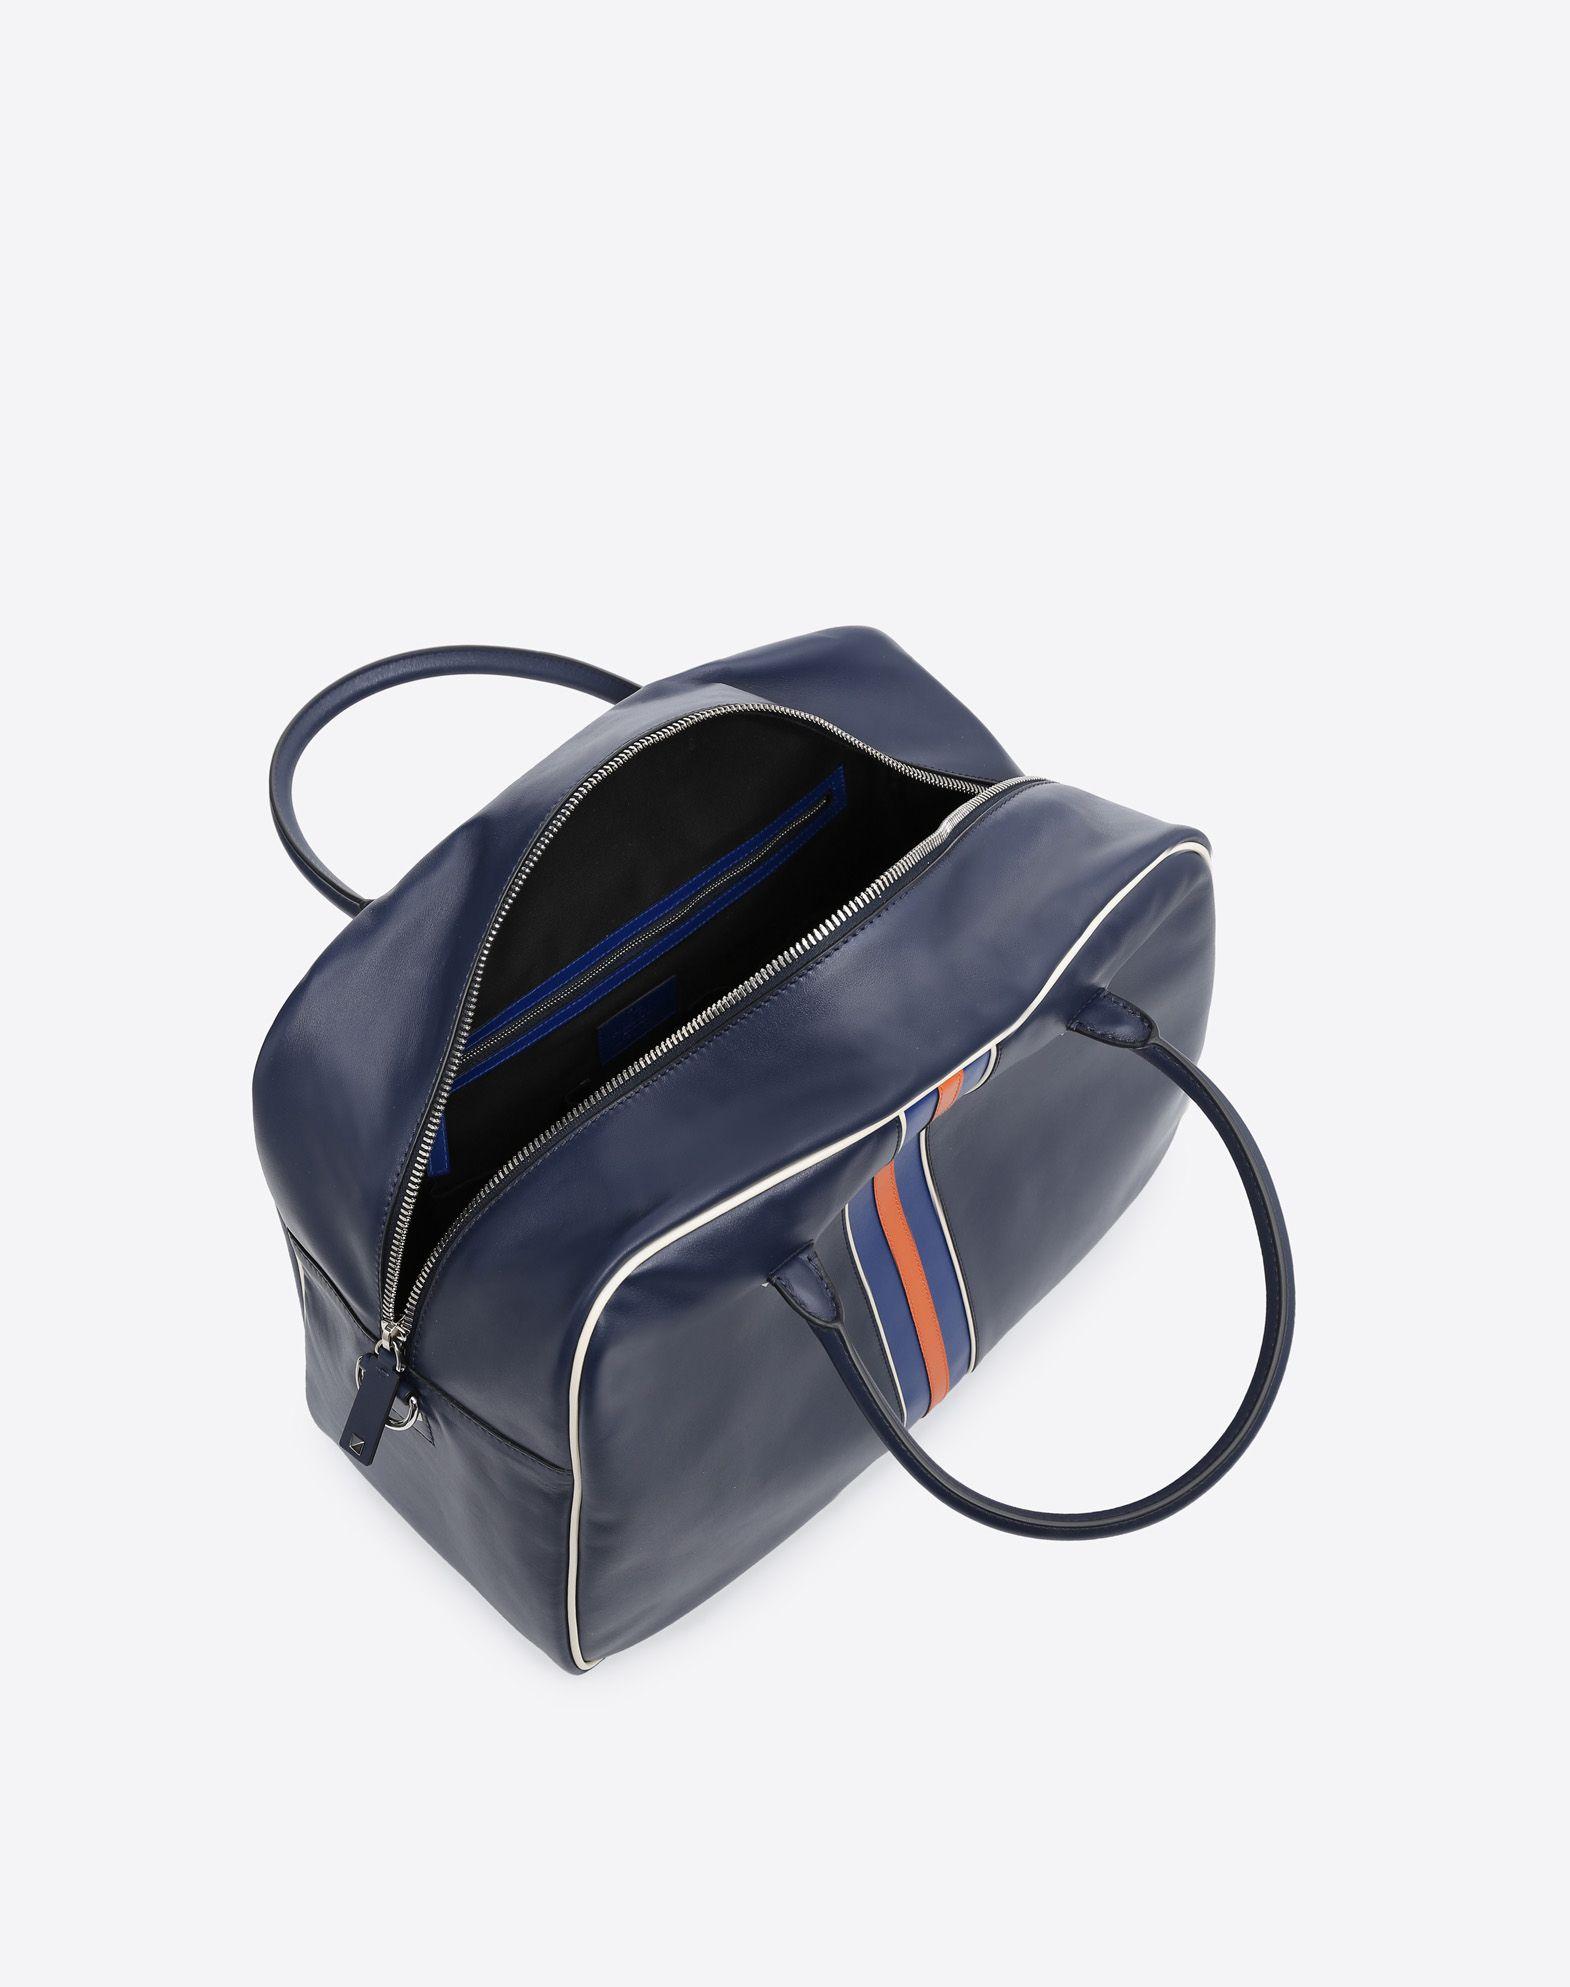 VALENTINO Logo Studs Dual zip closure Internal pockets Removable shoulder strap  45353085vv